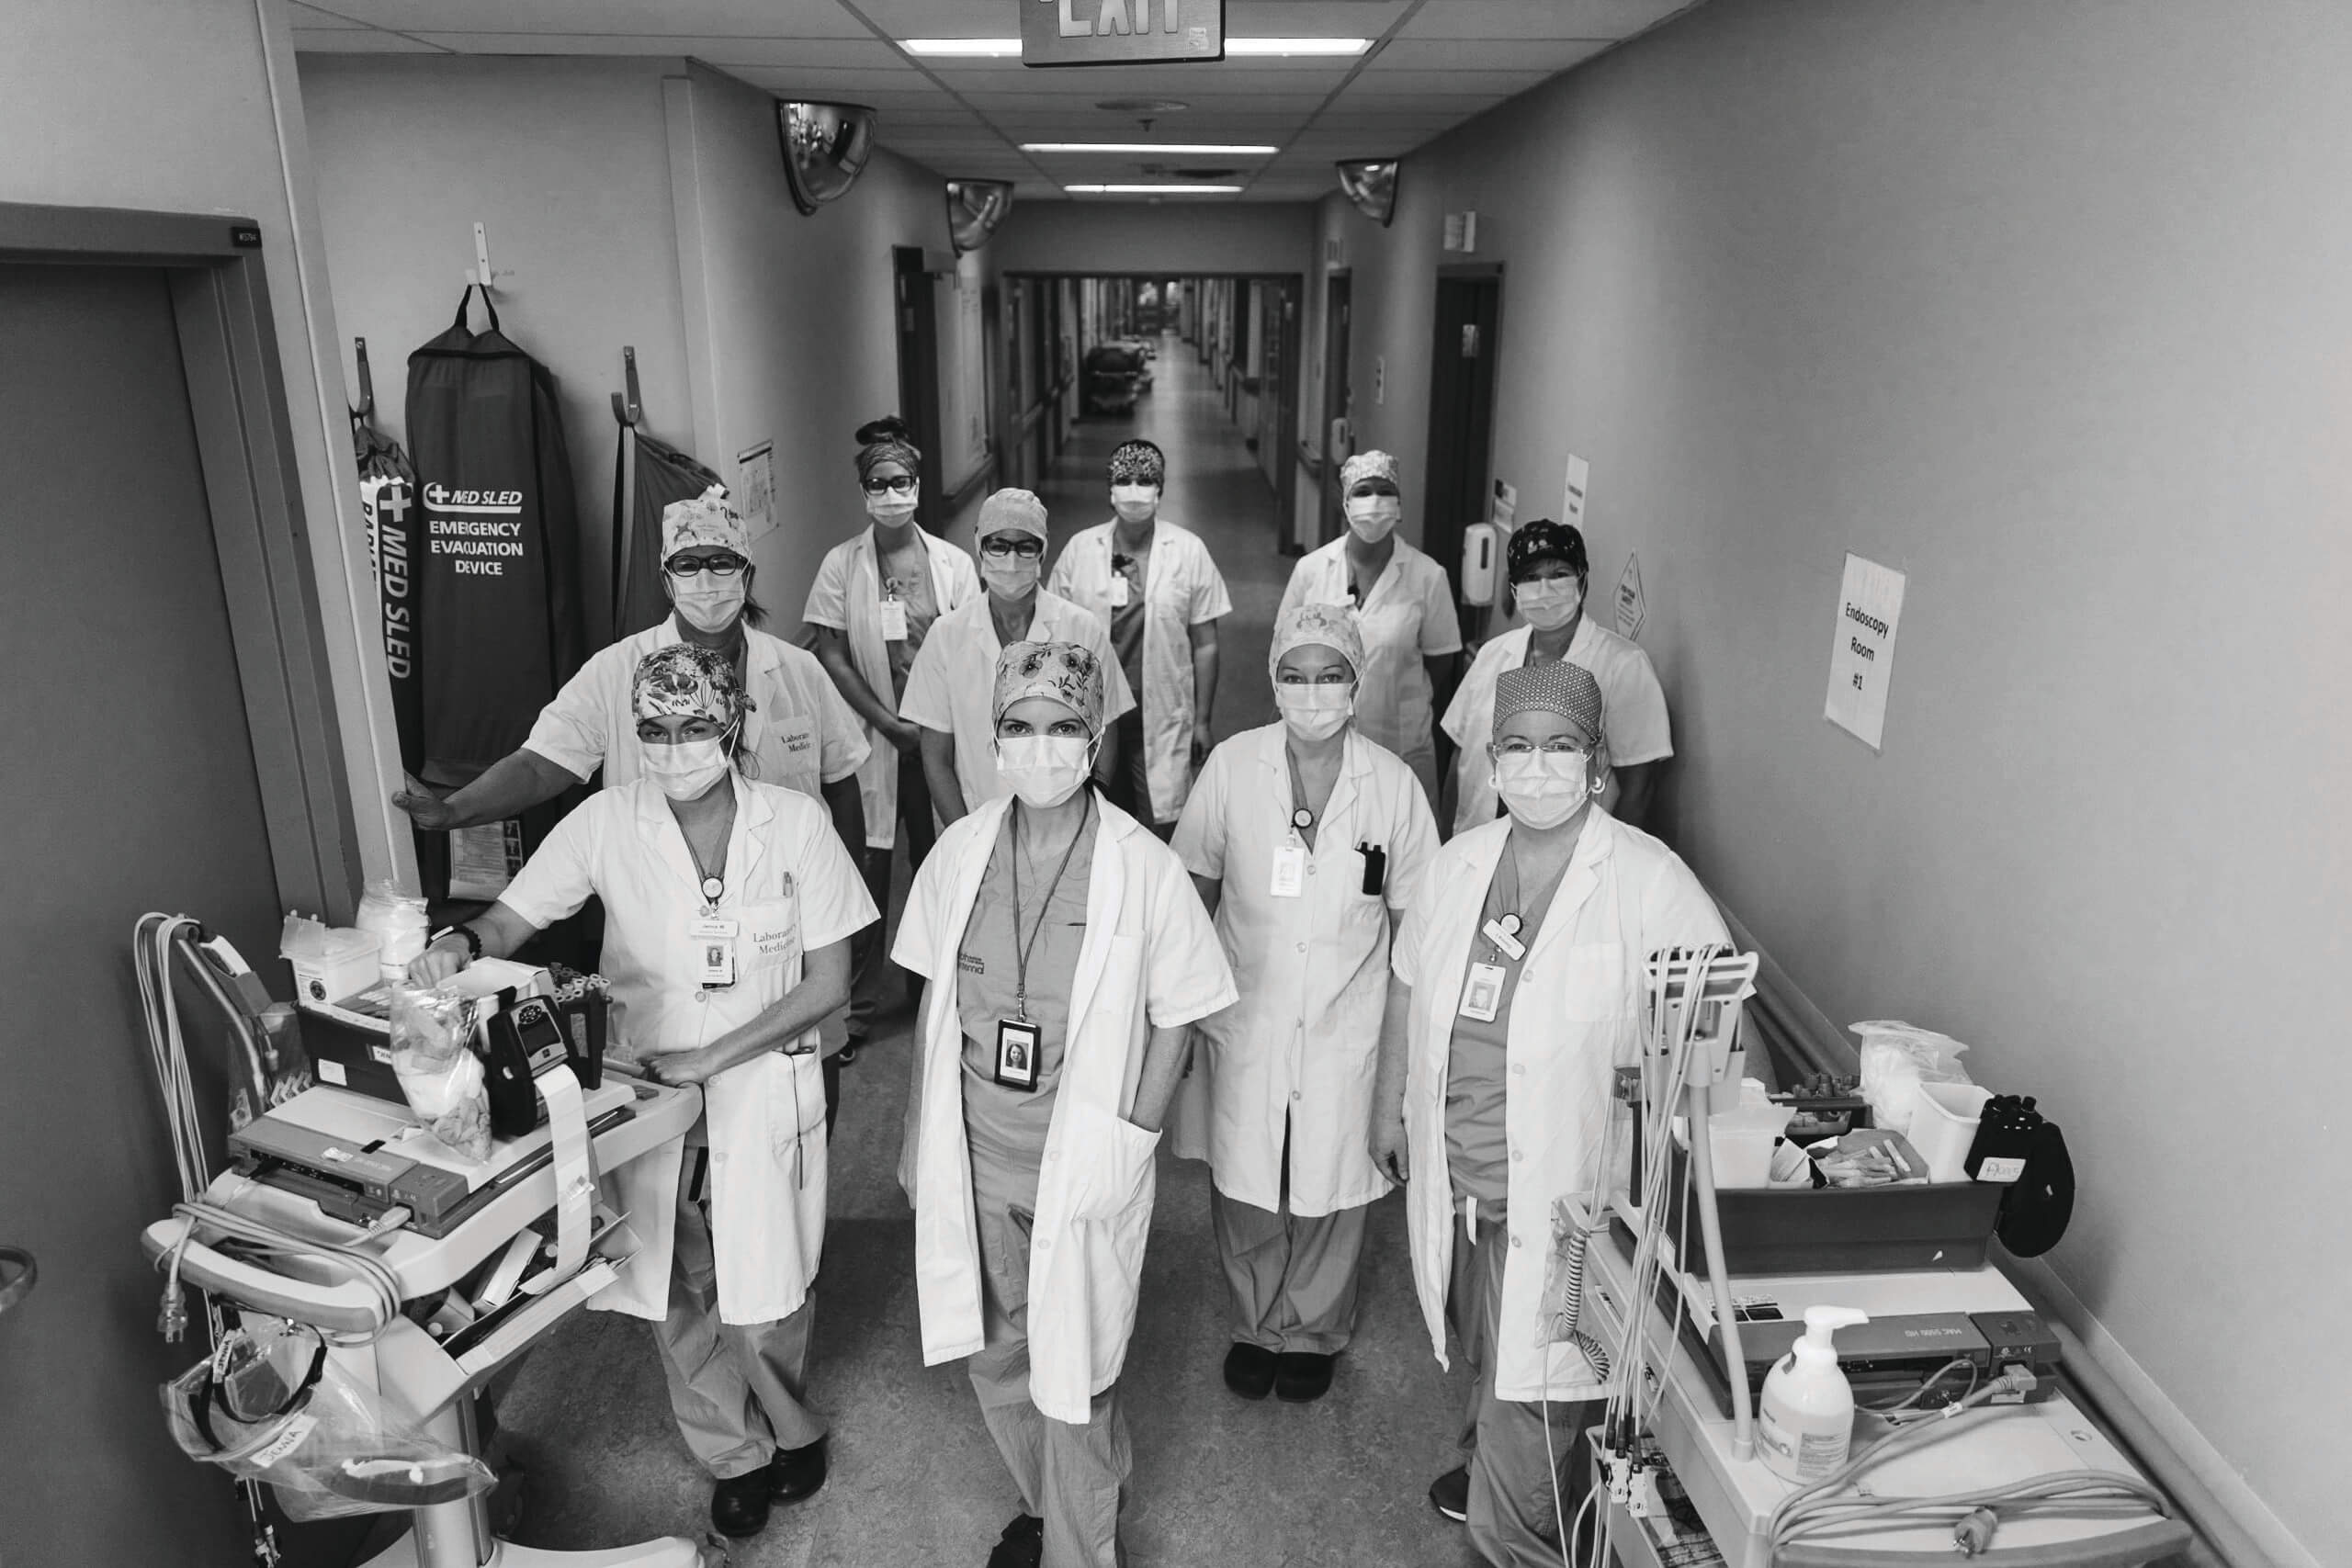 Laboratory Medicine Technicians stand with ECGs machines